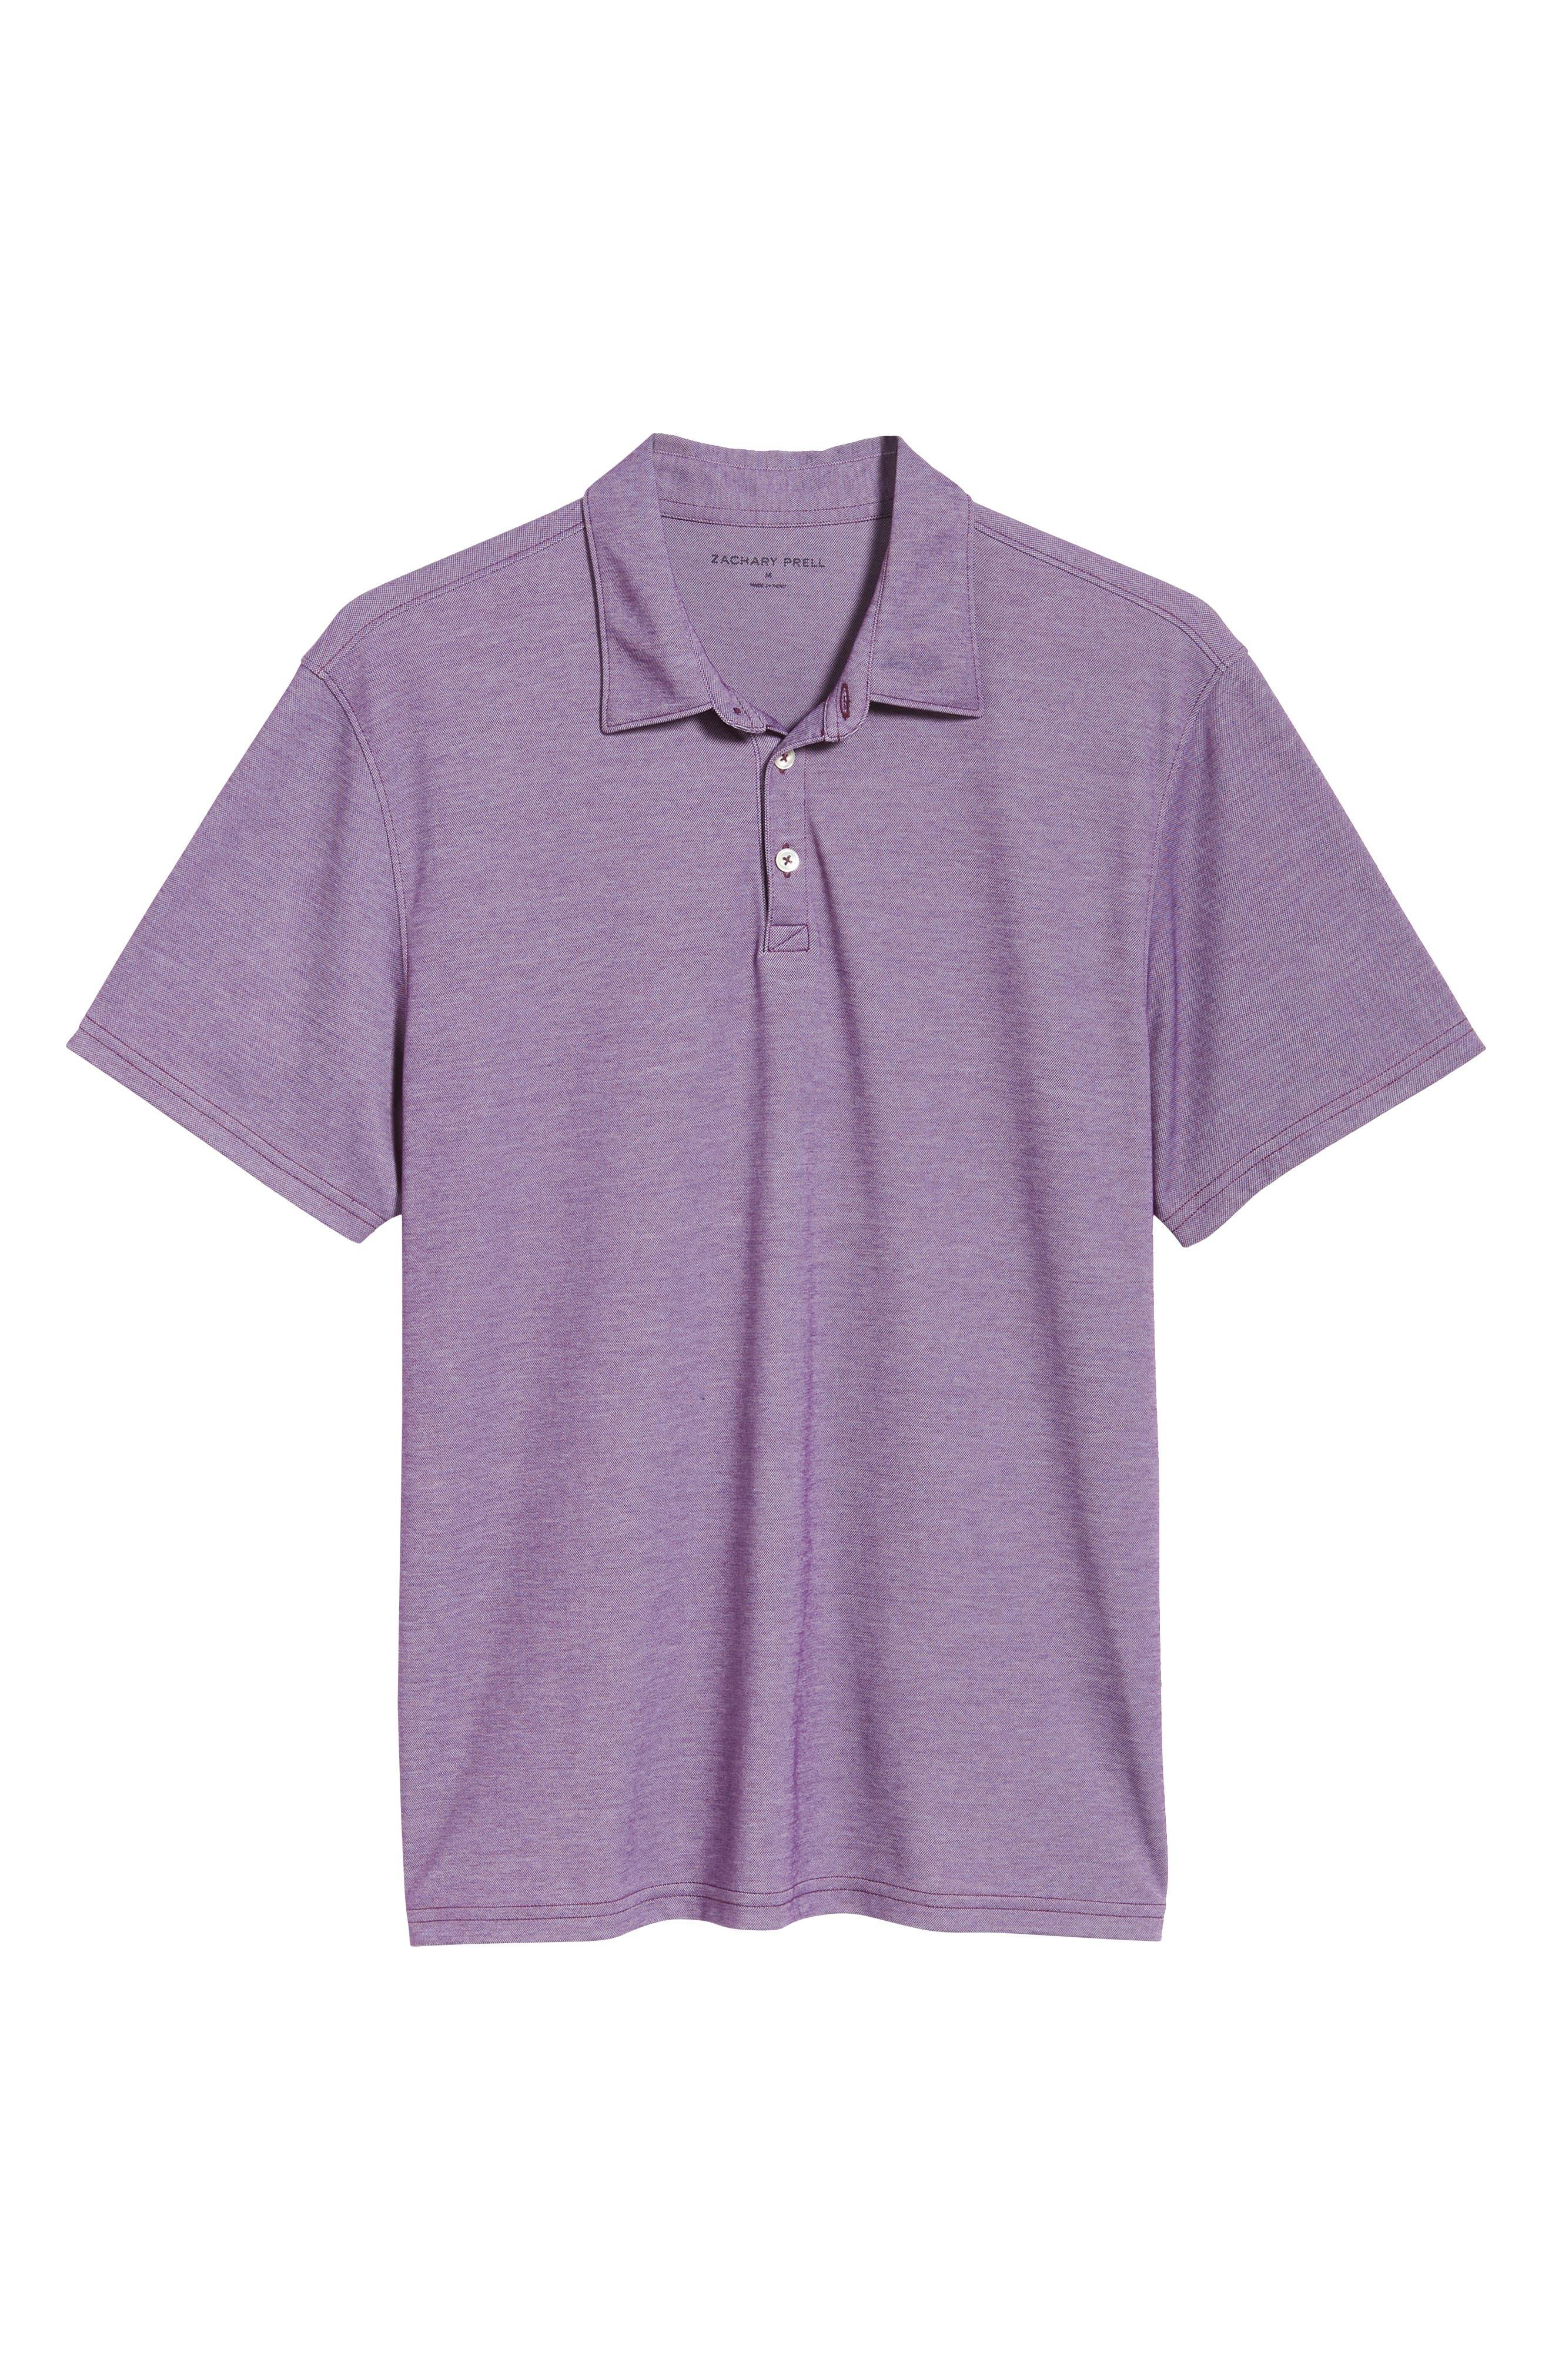 ZACHARY PRELL, Caldwell Piqué Regular Fit Polo, Alternate thumbnail 6, color, PURPLE